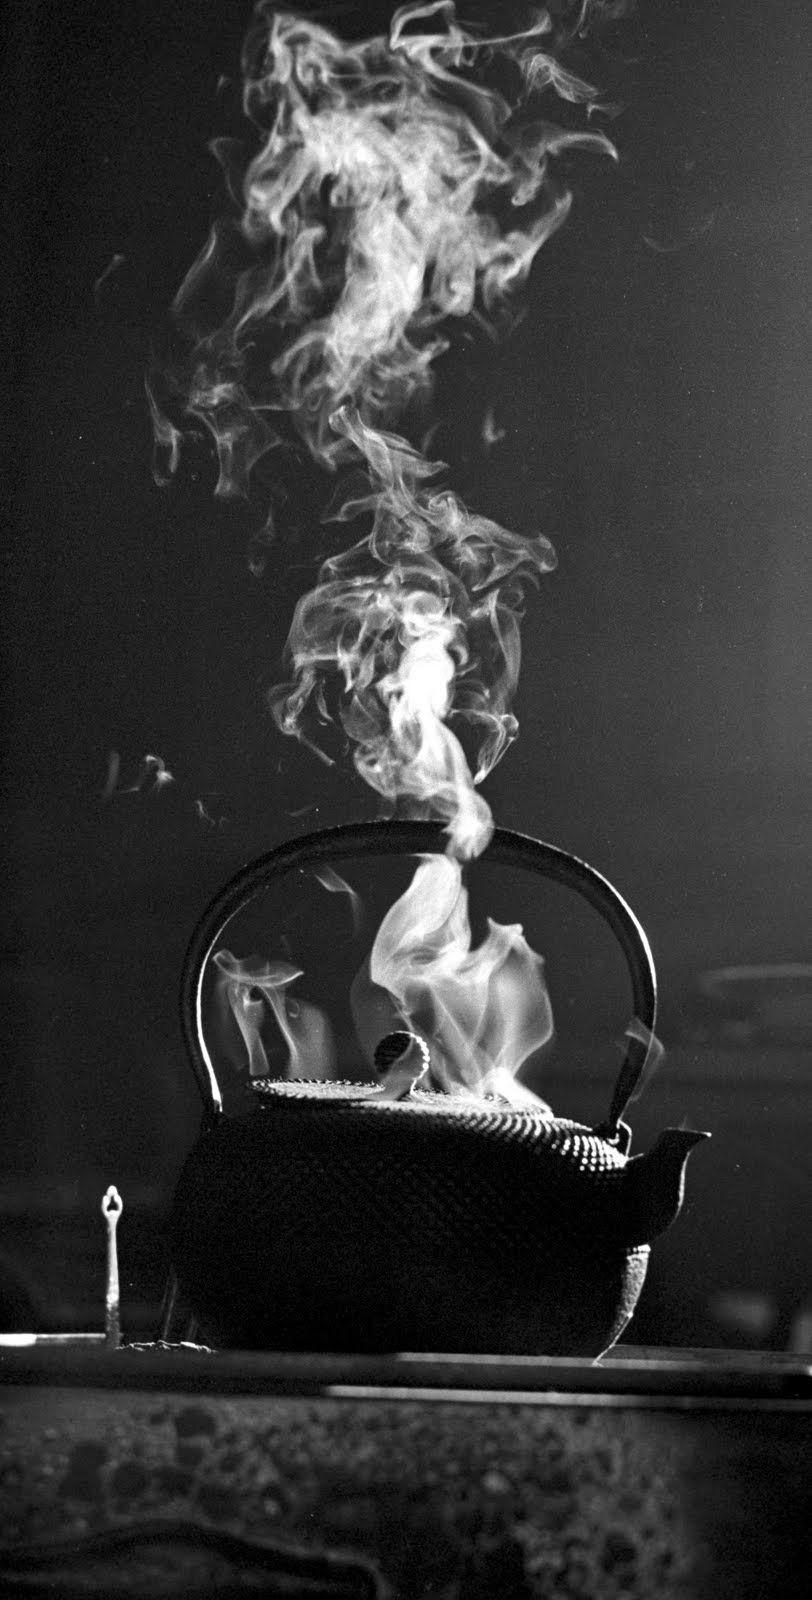 Commemorating The Art Of Richard Tudor Hibbert Steaming Tea Kettle Tea Kettle Tea Art Drinking Tea